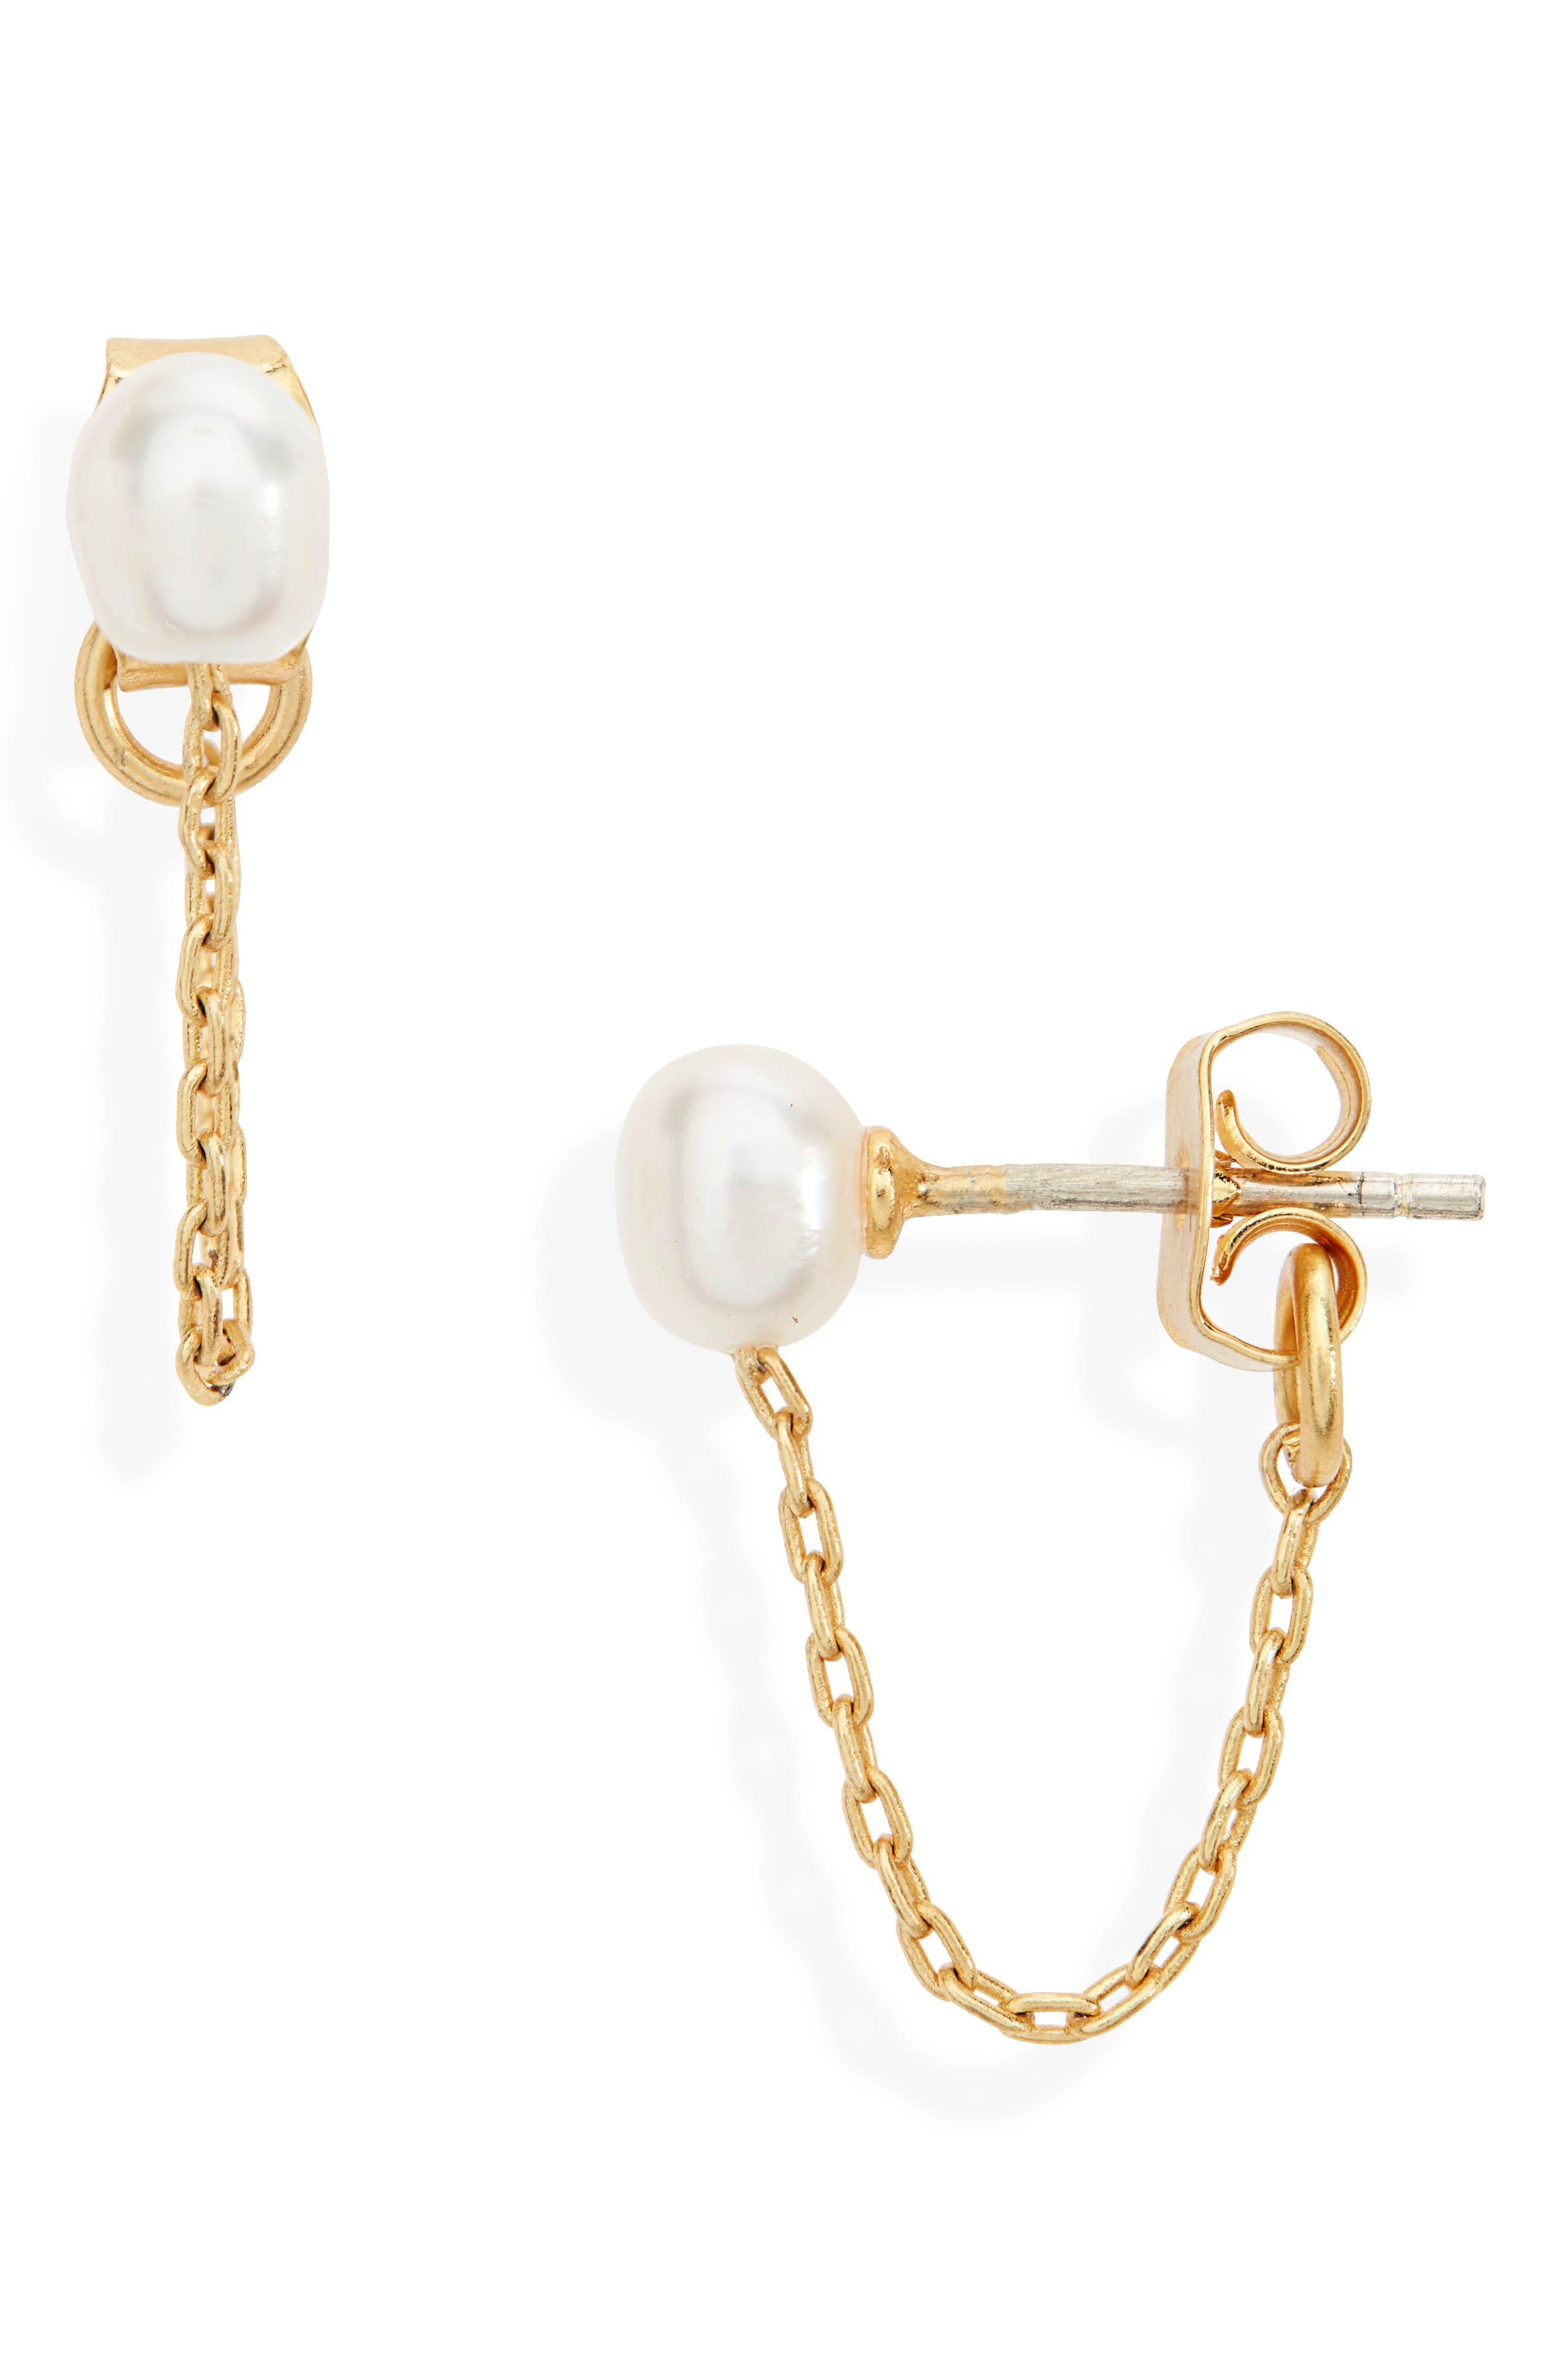 Freshwater Pearl Chain Stud Earrings